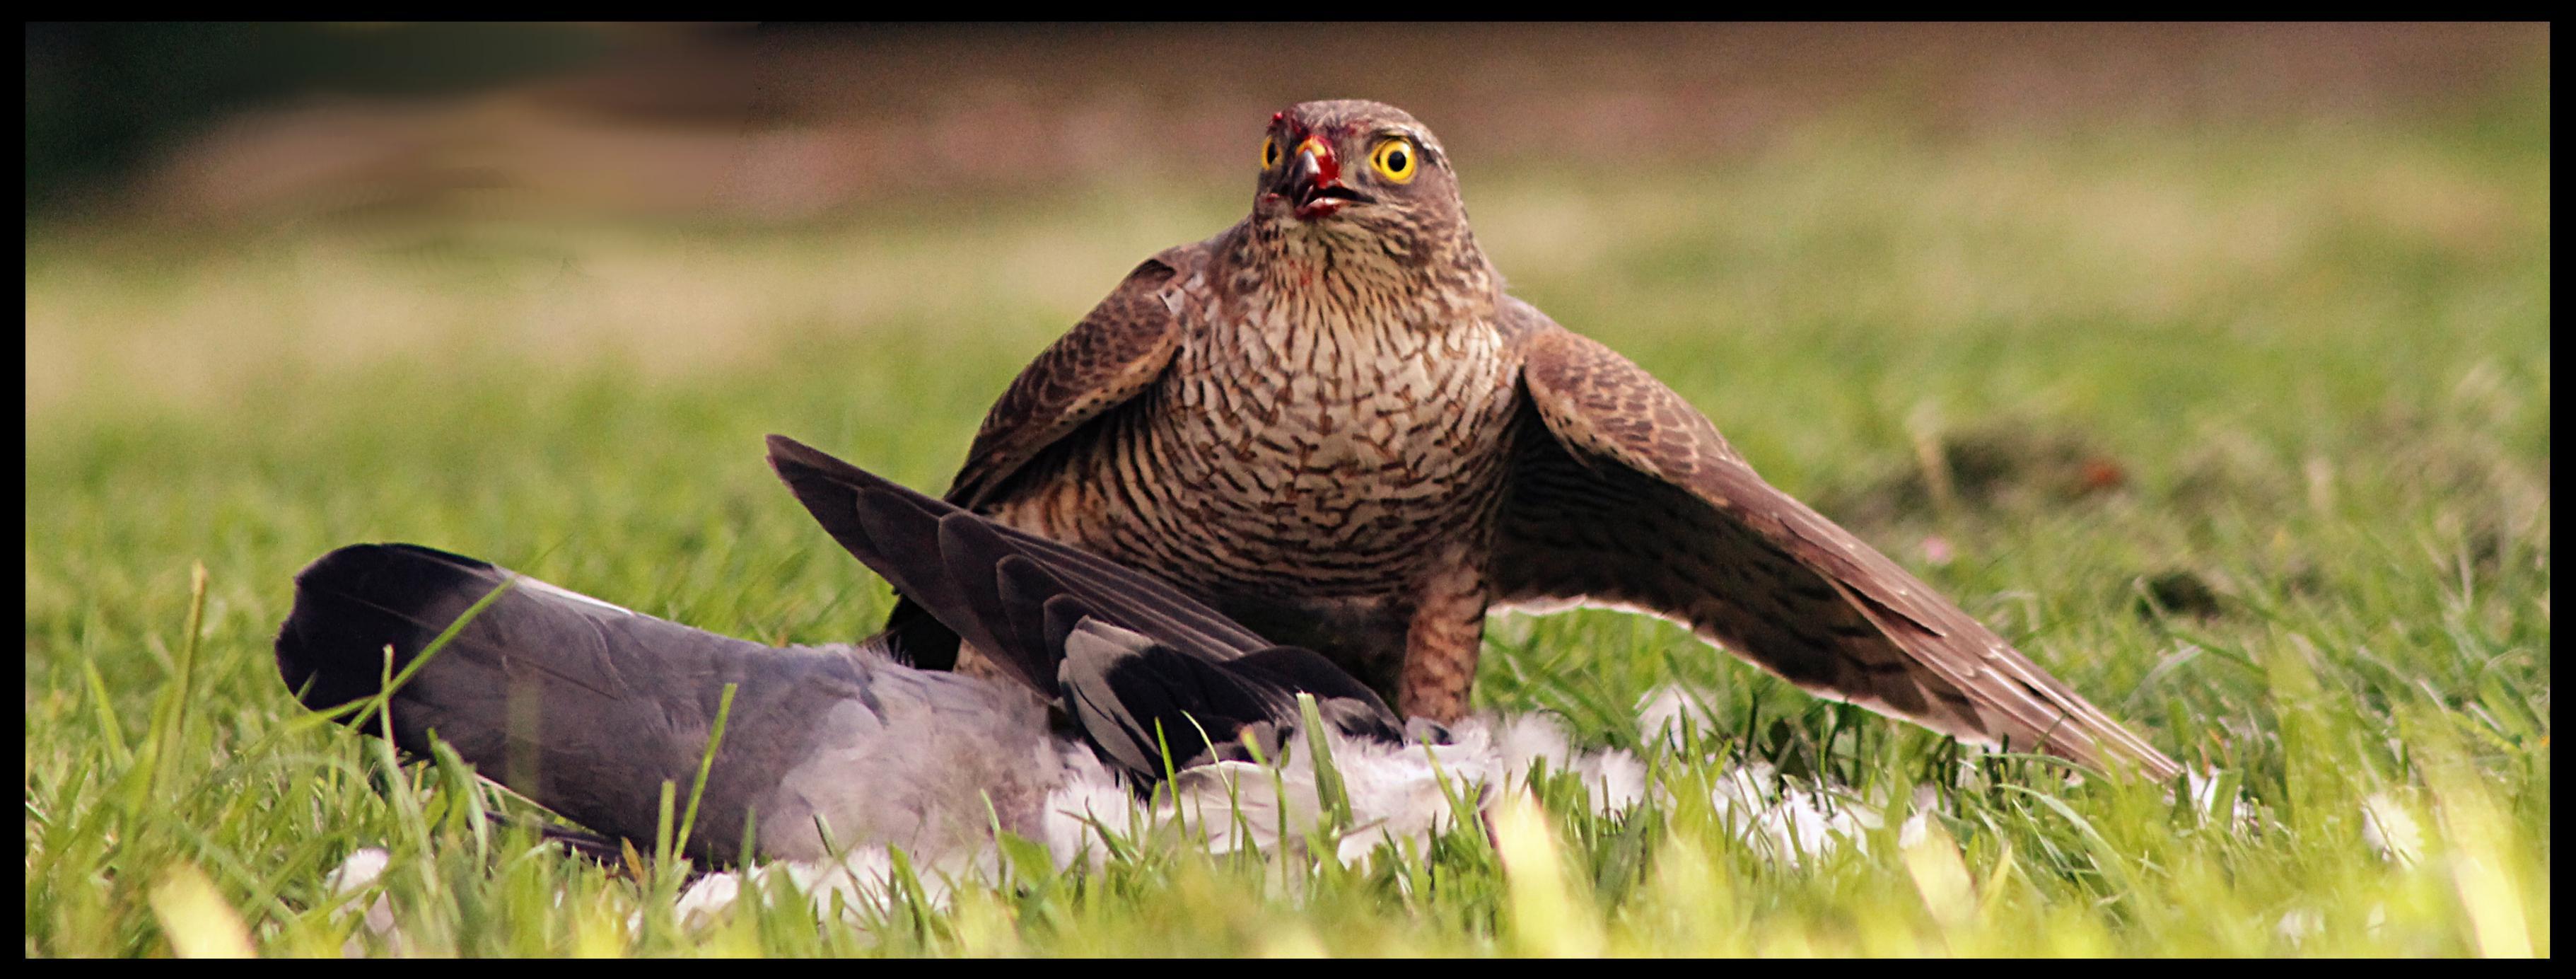 Name:  Sparrowhawk3.jpg Views: 47 Size:  495.0 KB